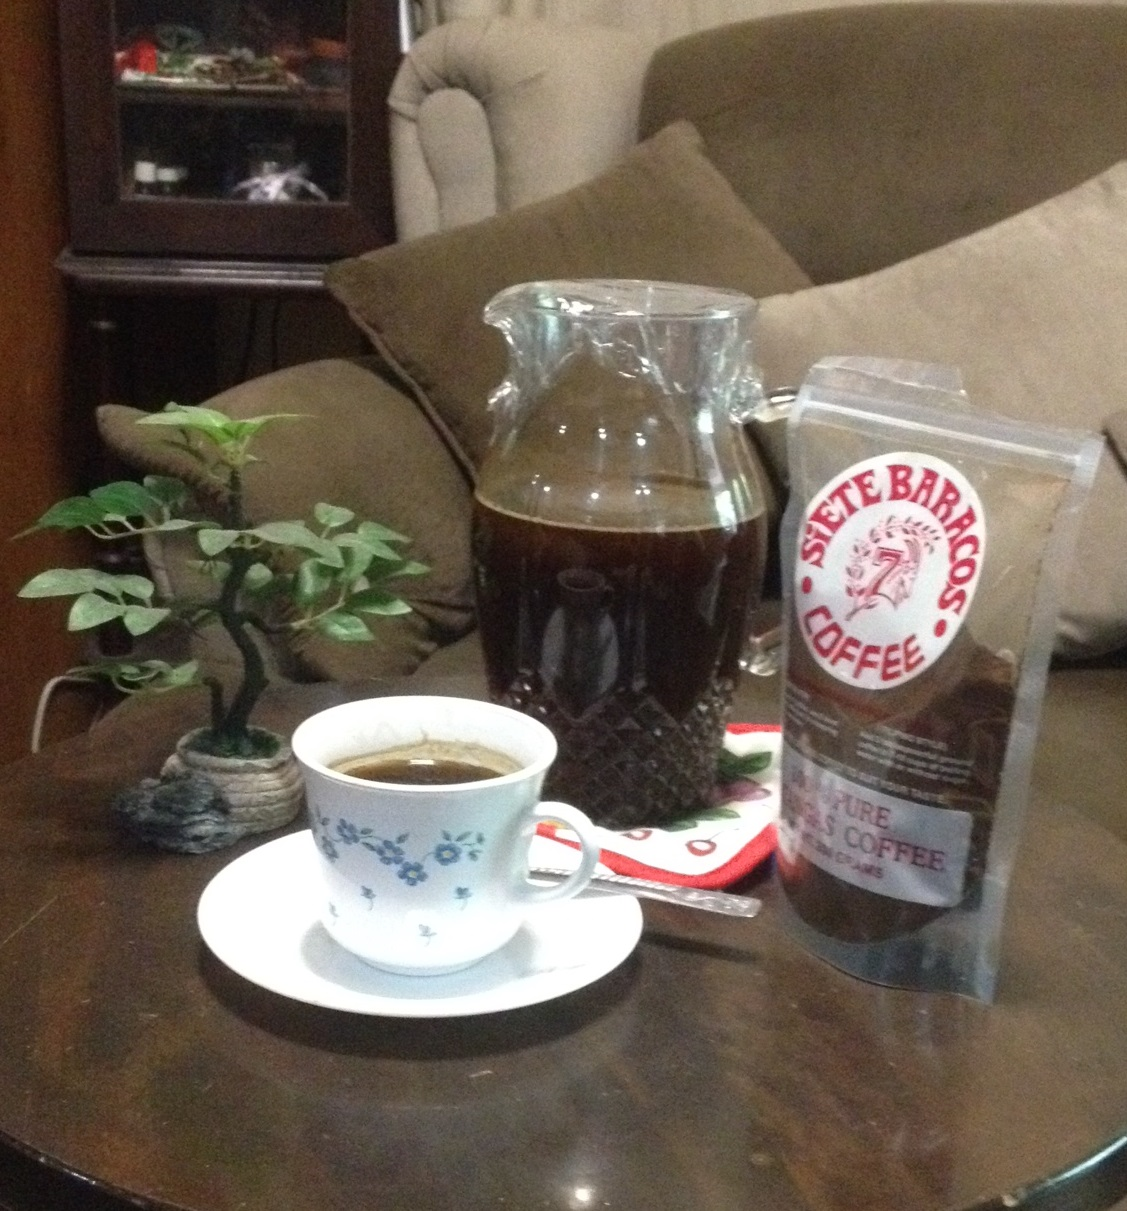 philippine coffee barako Barako bean co premium coffee from the philippines uk roasted.